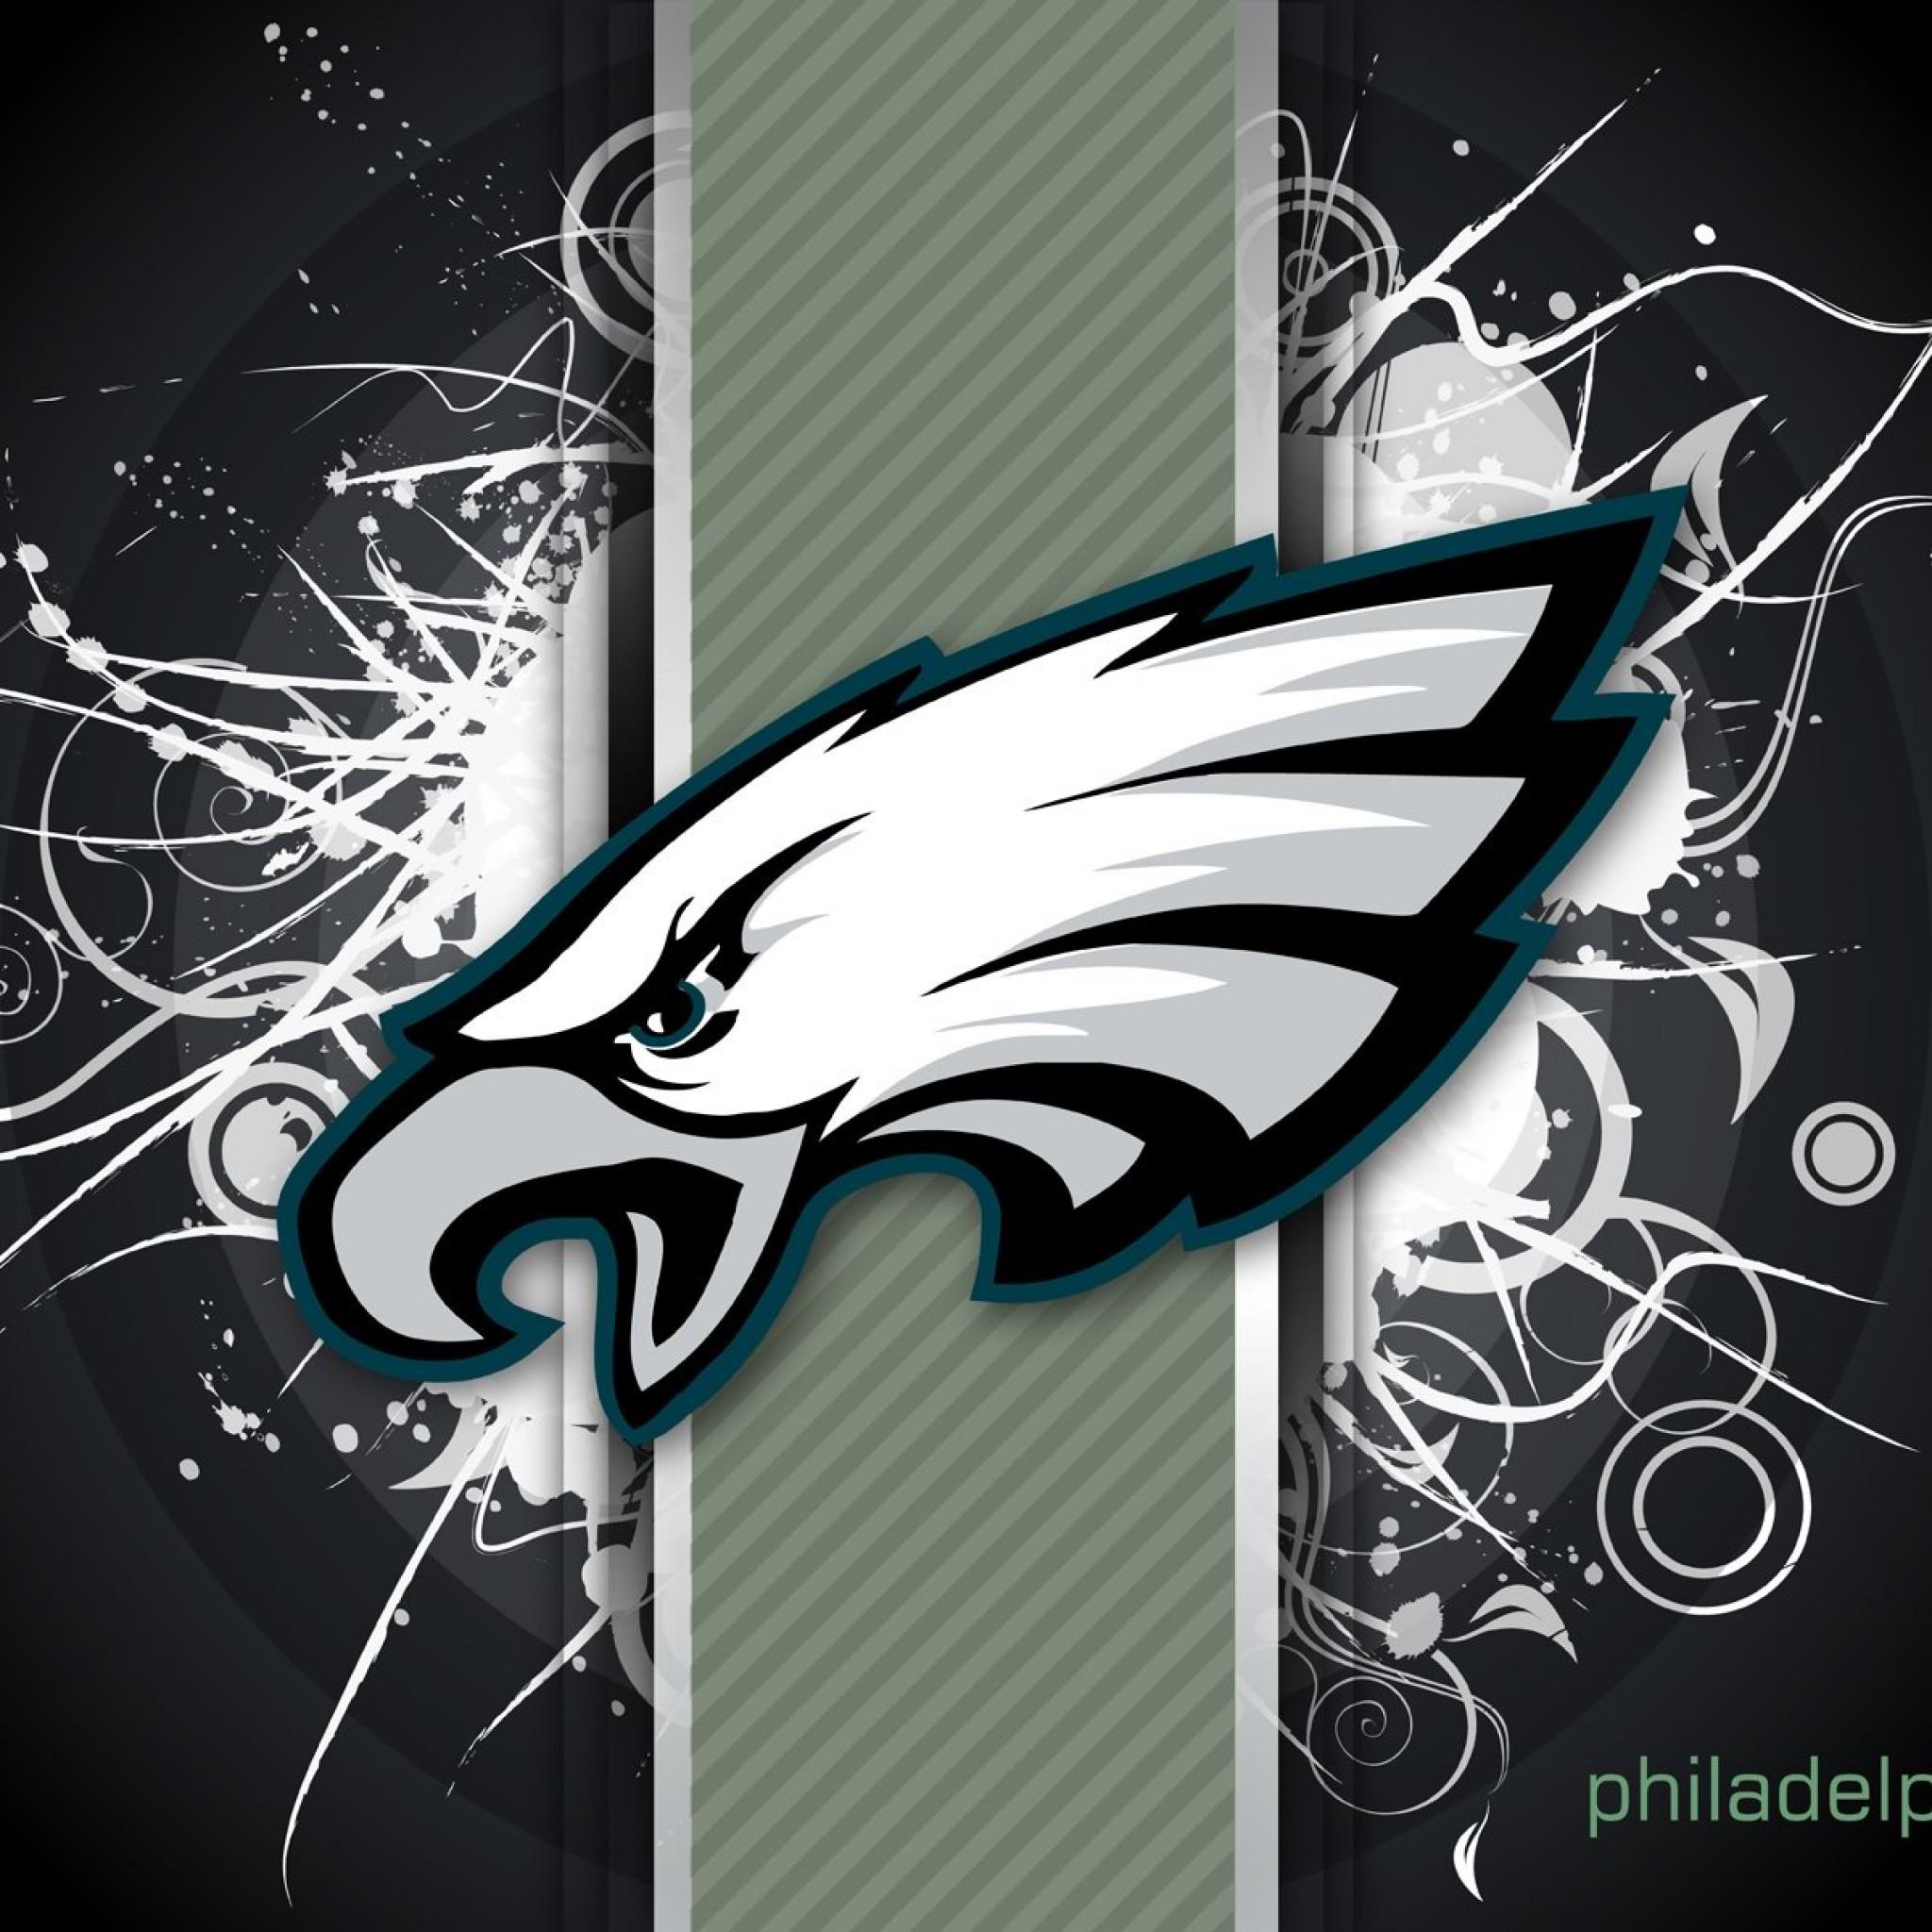 Philadelphia Eagles HD Wallpaper & Pictures